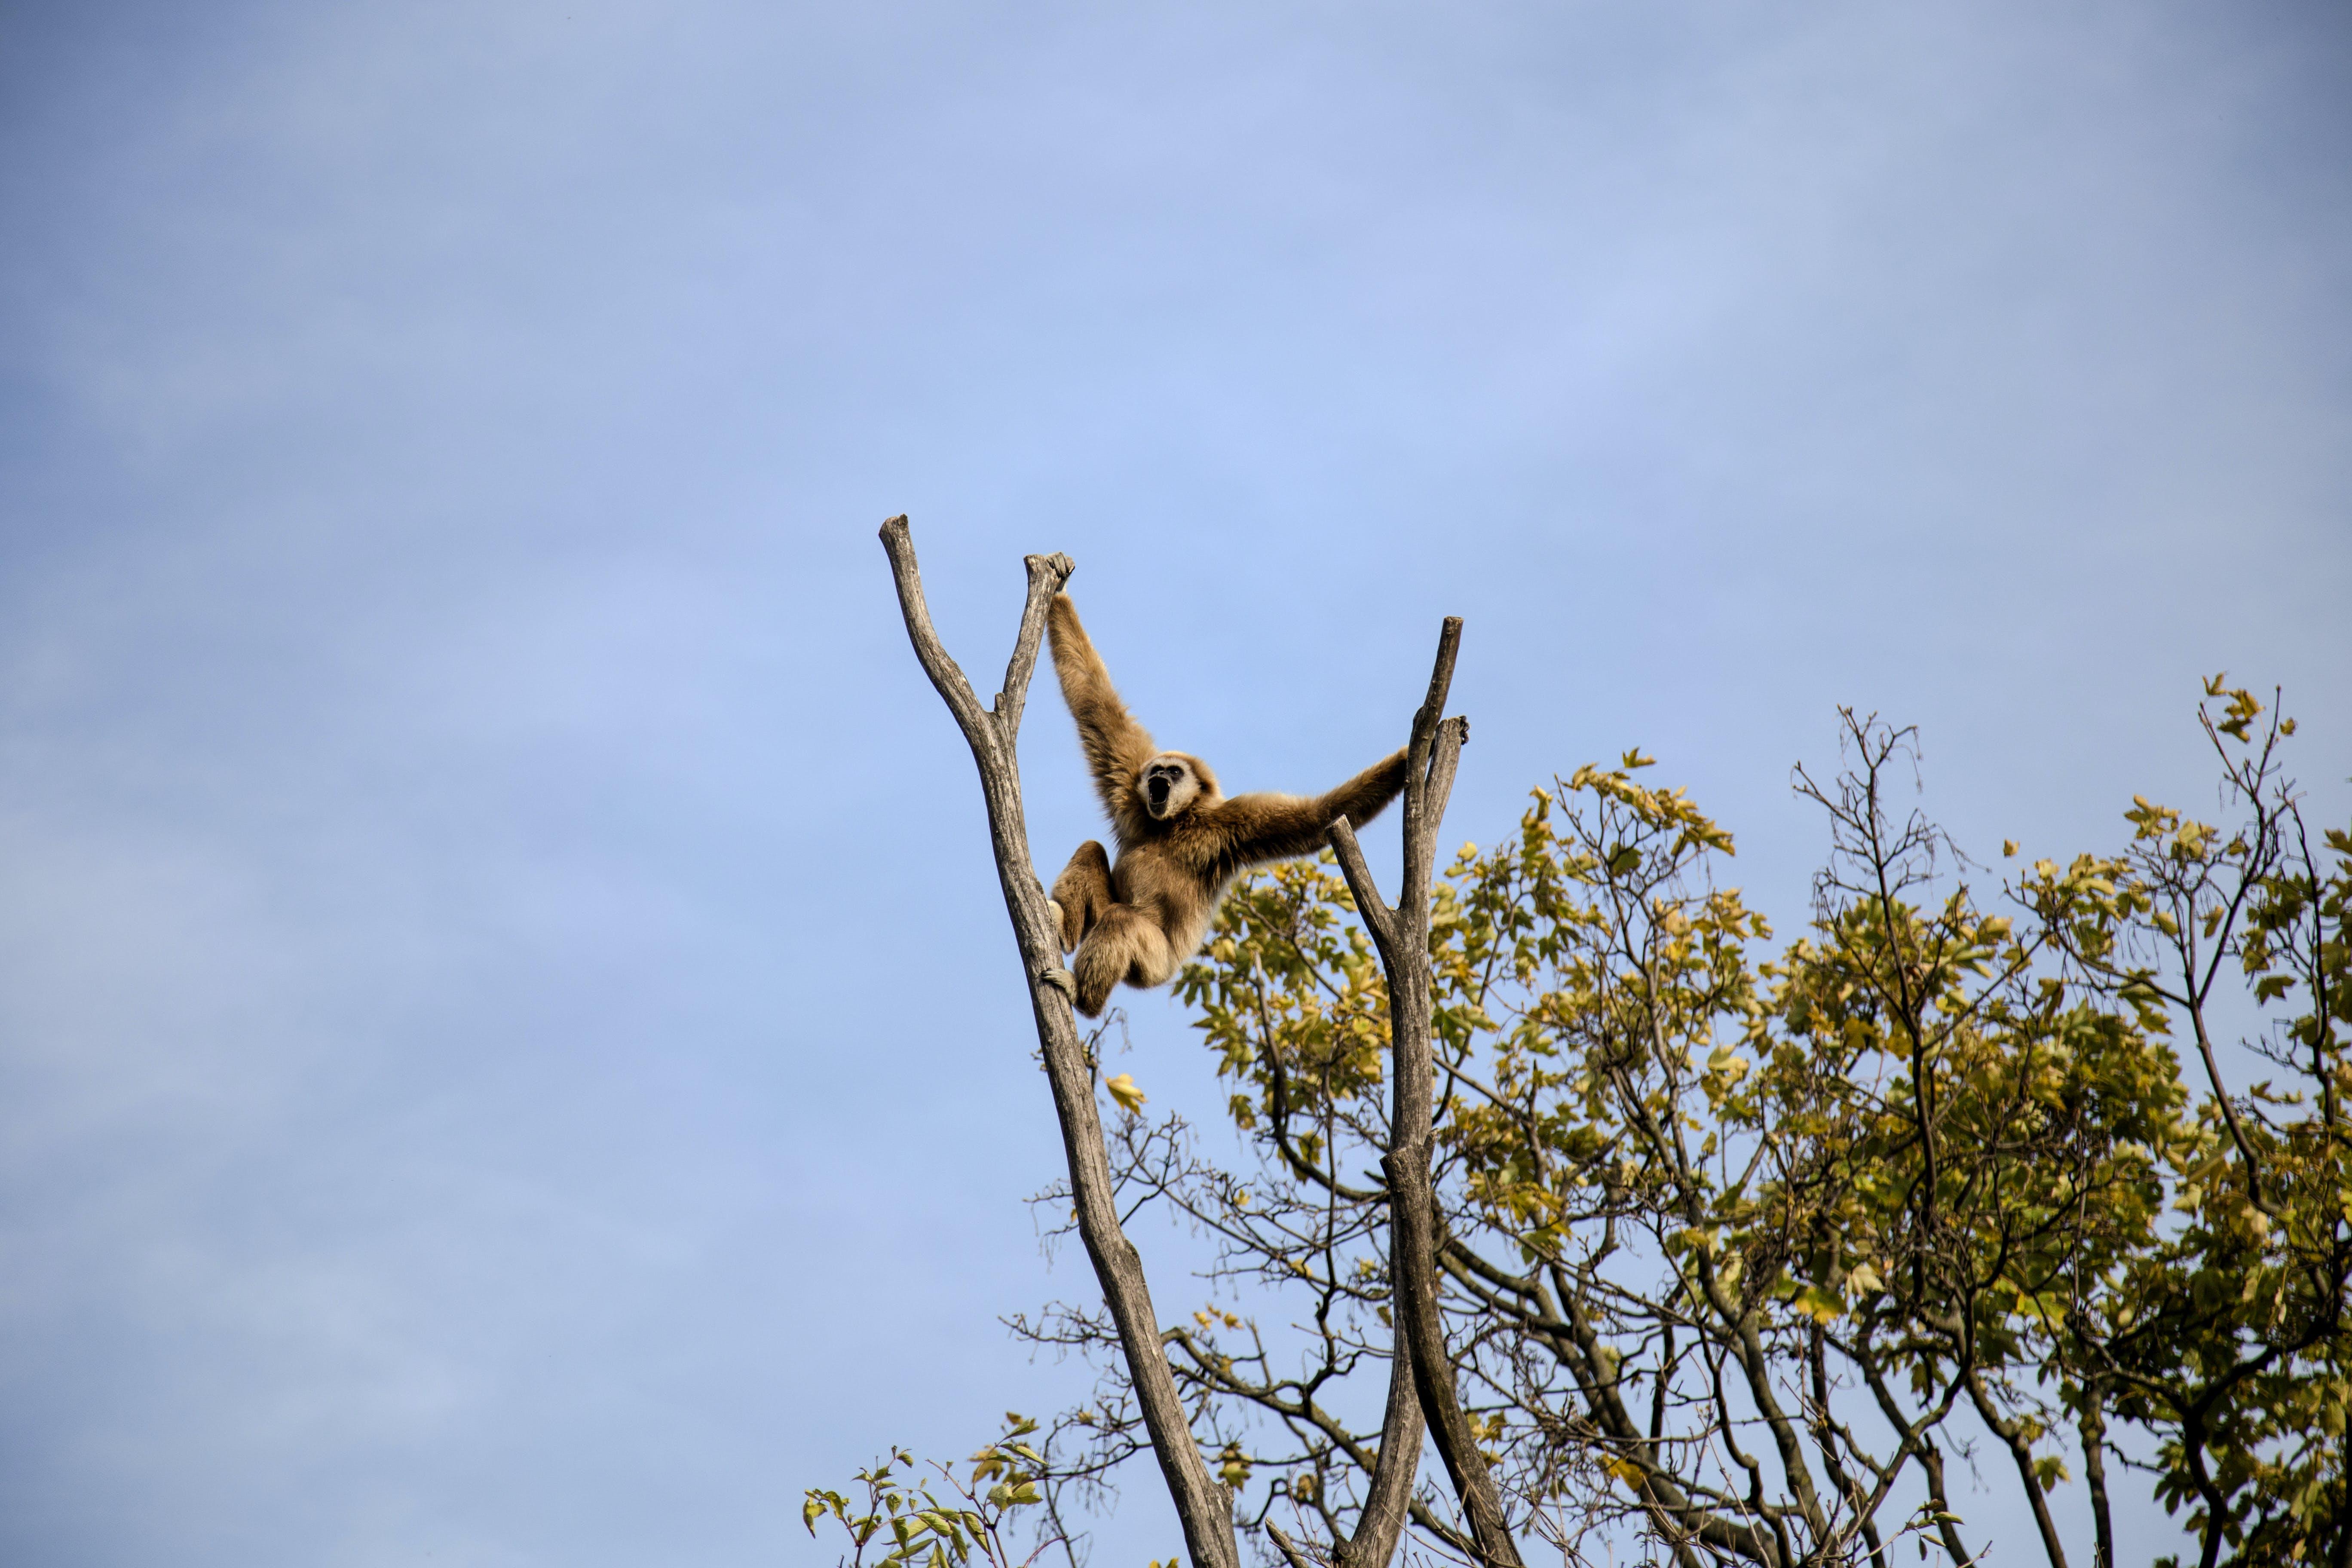 Photography of Monkey Climbing on Tree